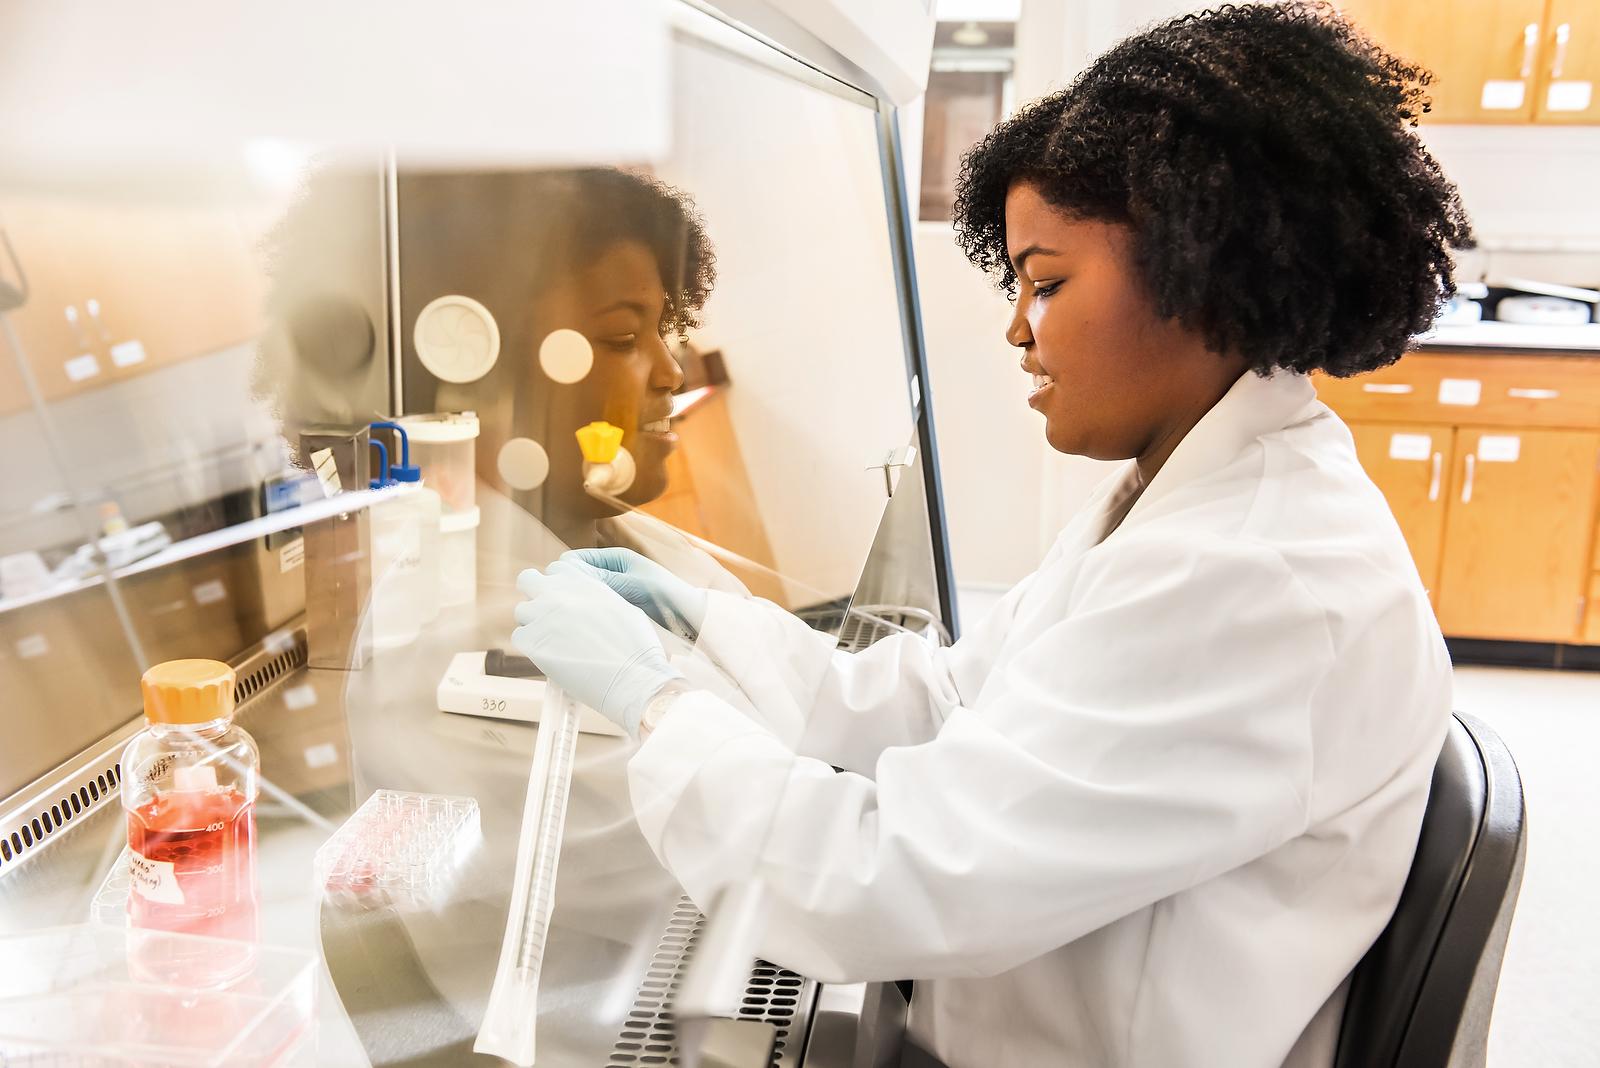 Athens & Atlanta Higher Education Photographer  STEM, Science, Technology, Engineering, Medical & Lab